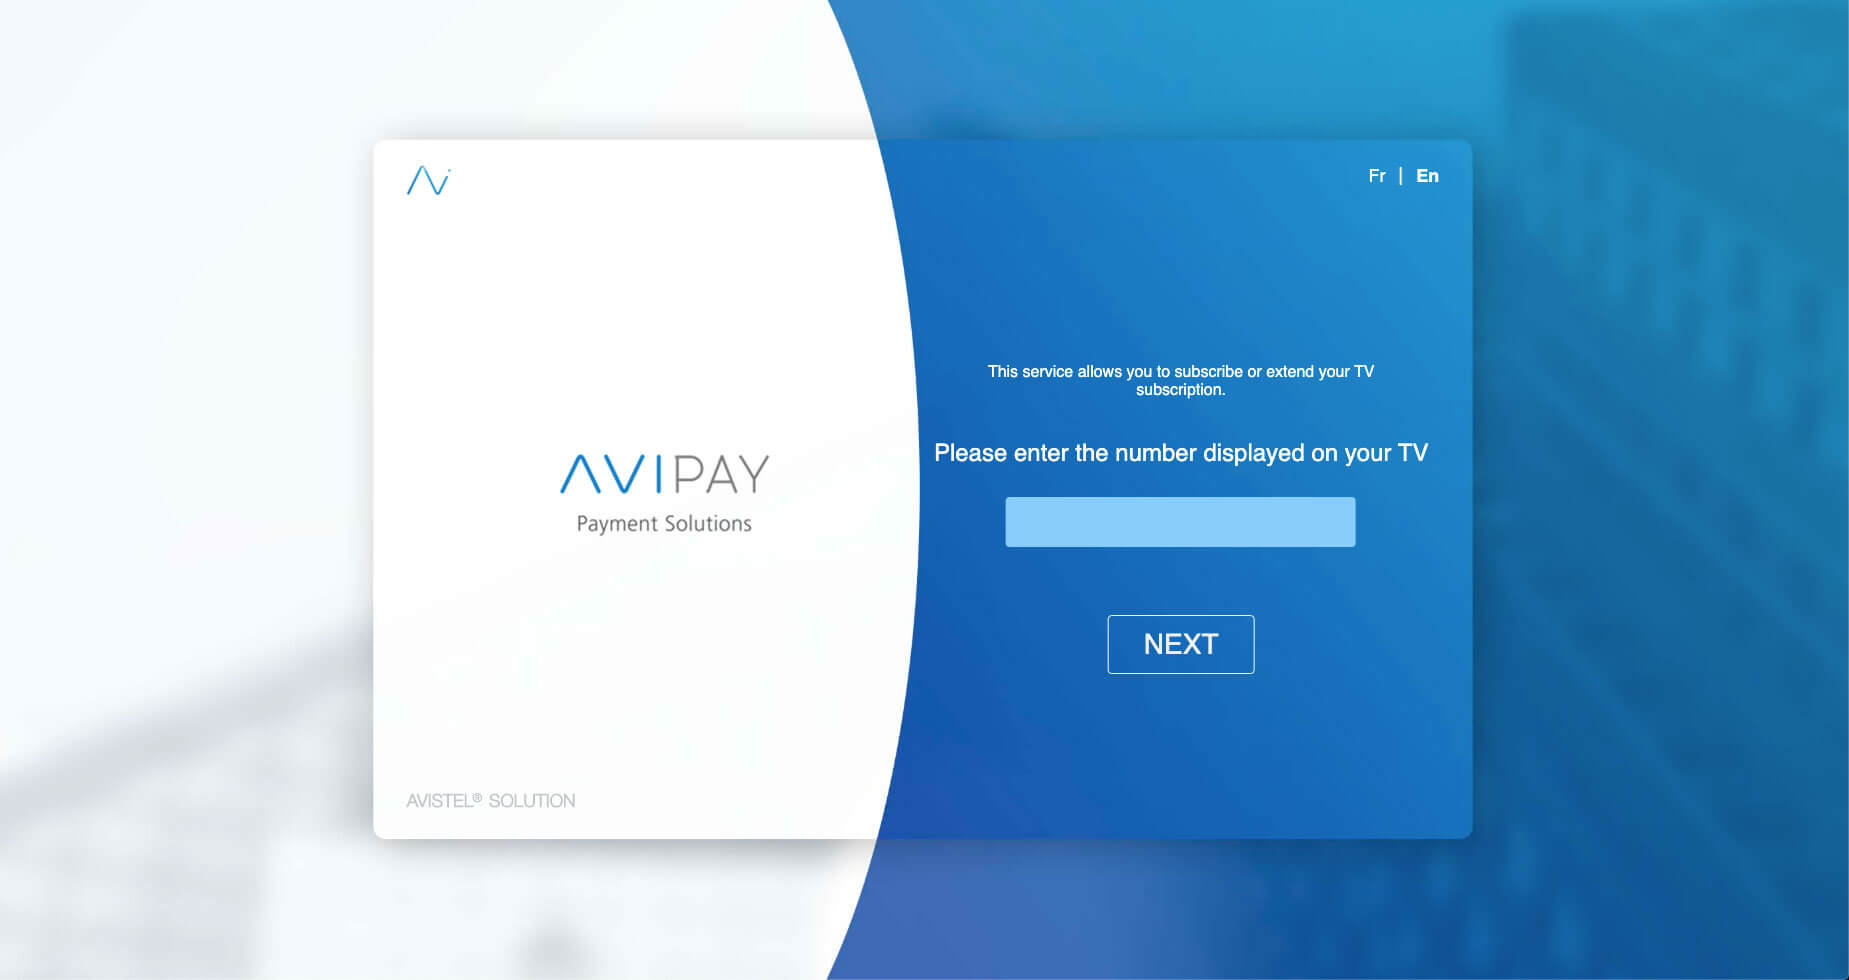 AVIPAY TV subscription UI